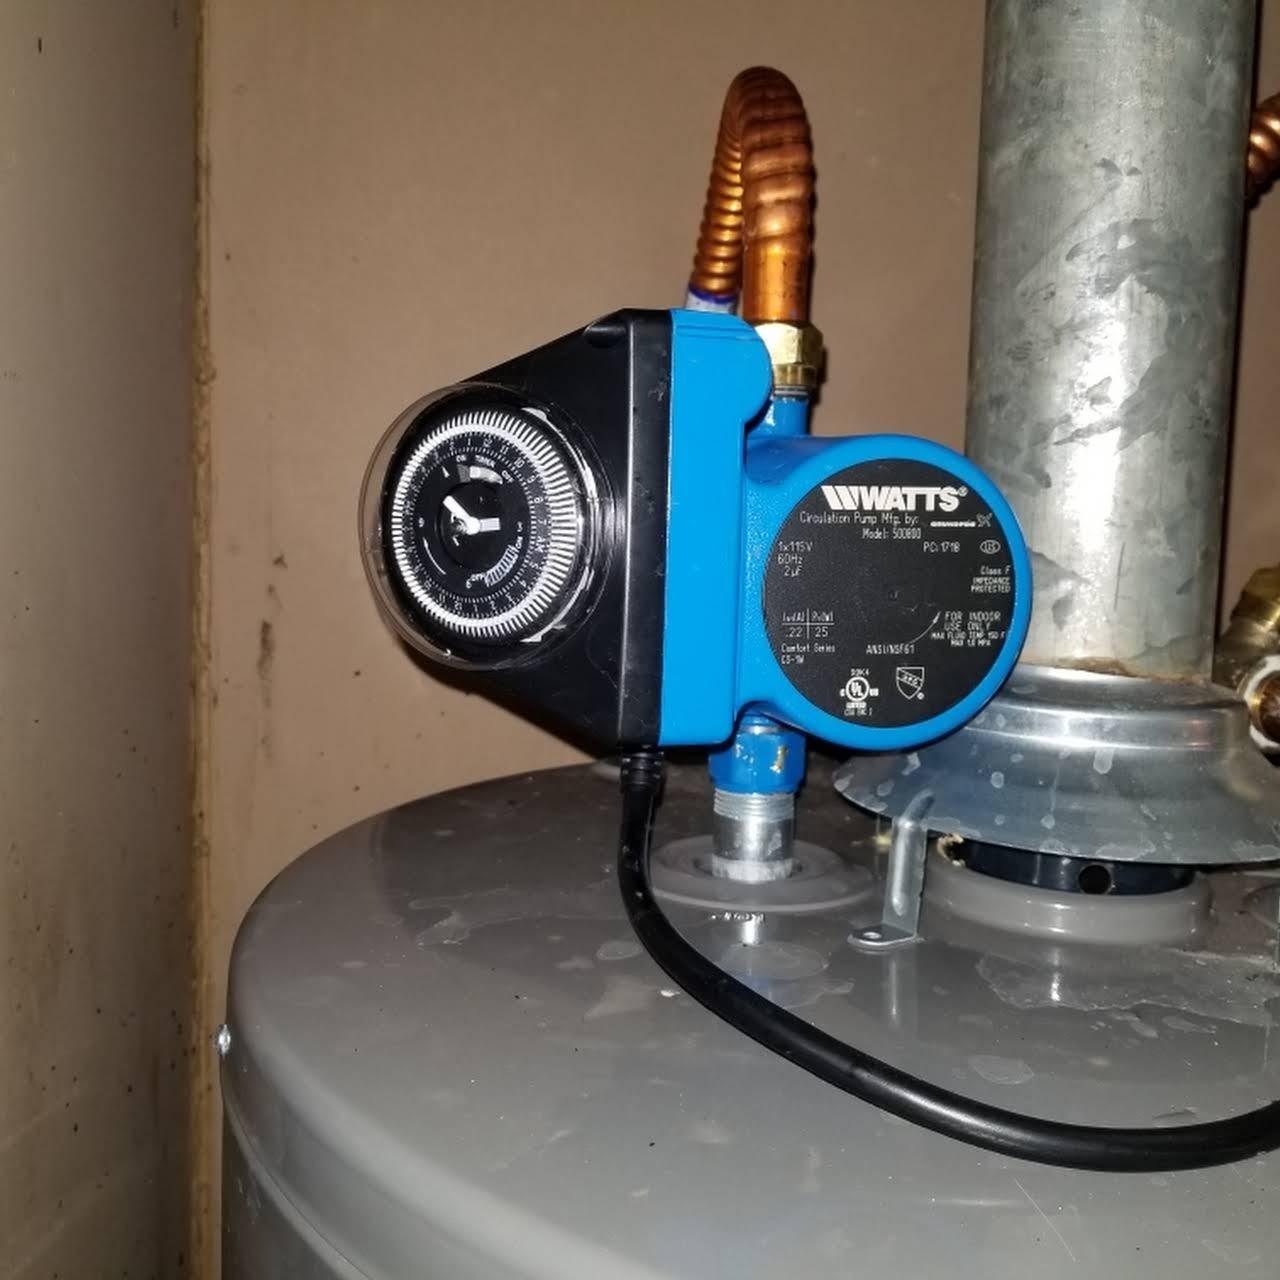 inc key plumbing cruz certified ent plumber url secret santa api duncanplumbing duncan report us diamond